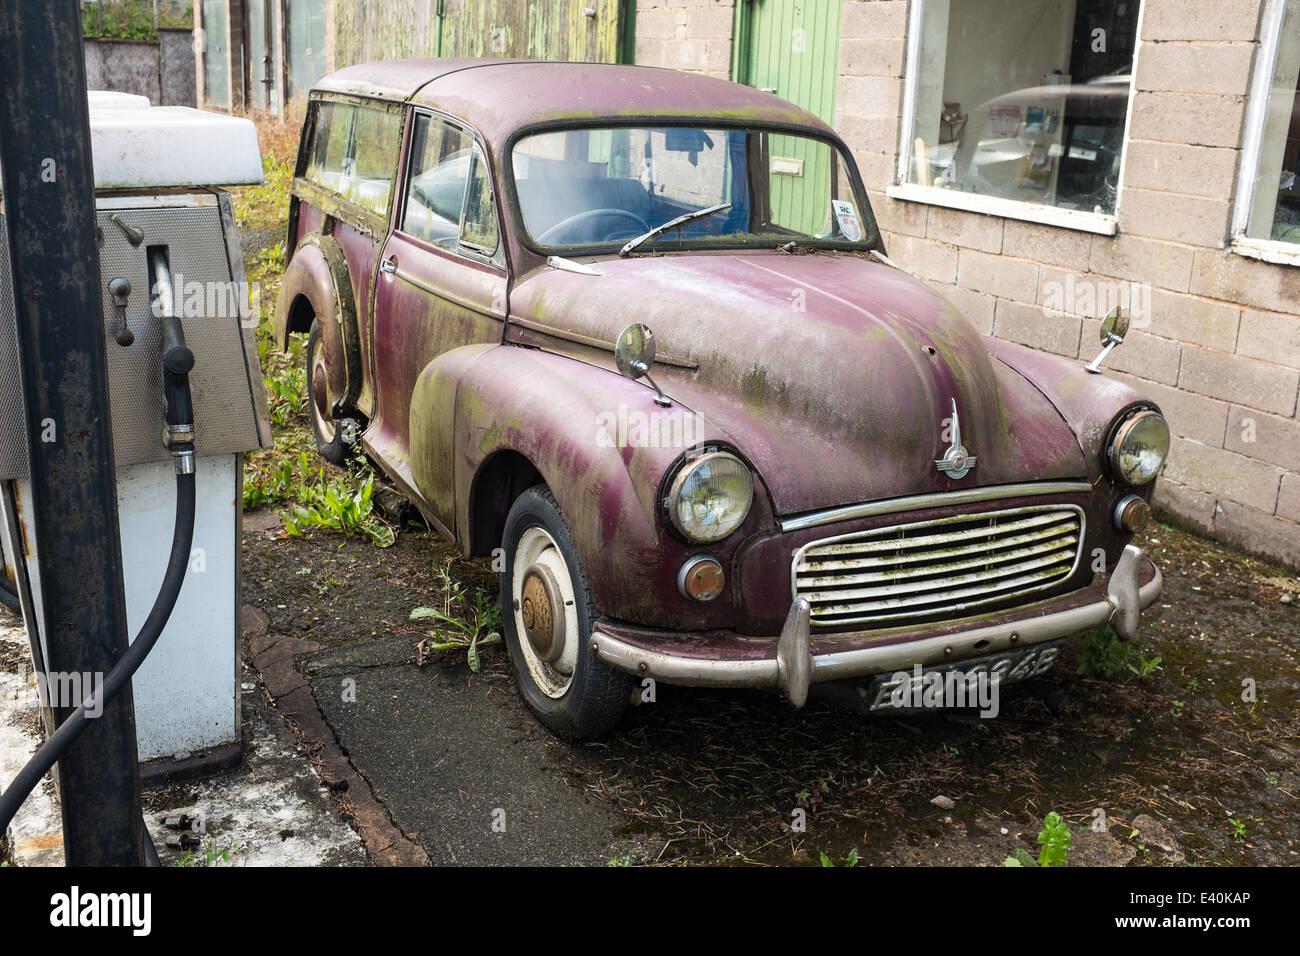 Old Morris Minor Traveller car - Stock Image